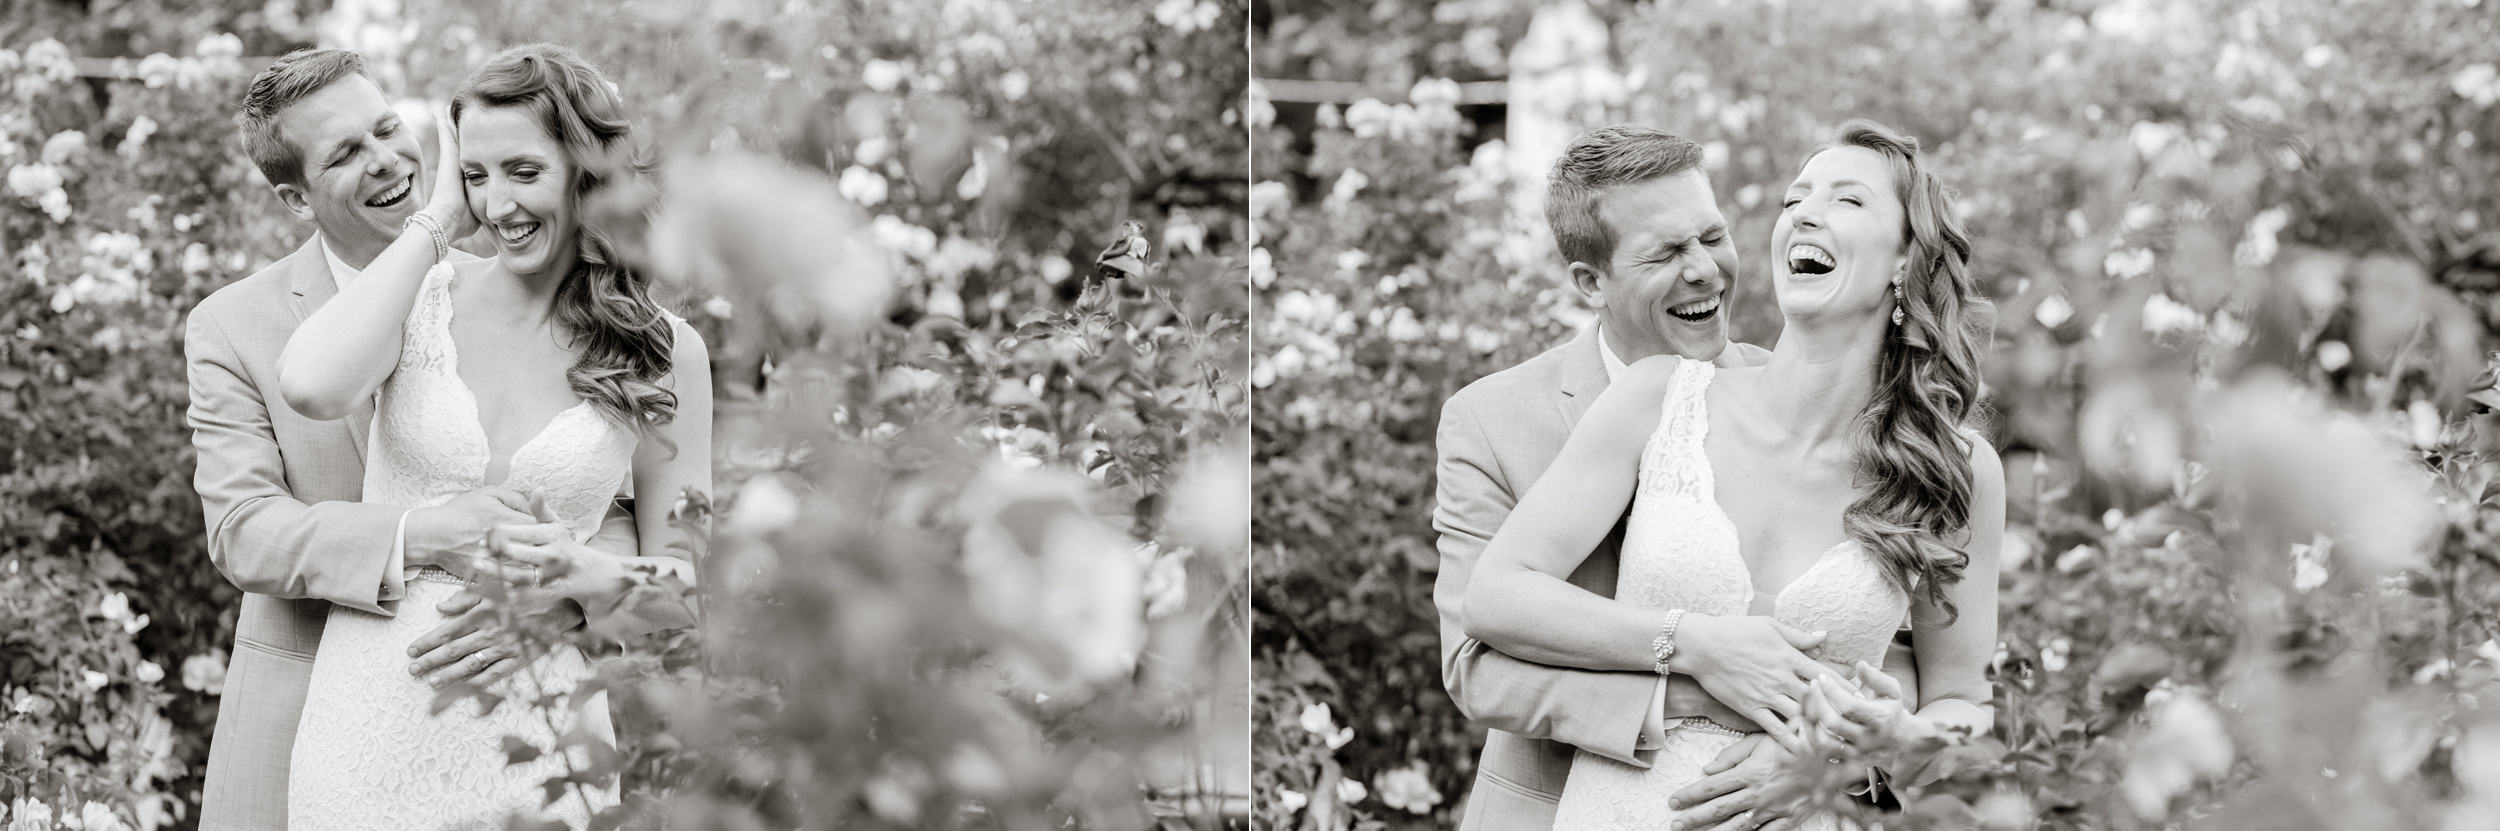 50-down-to-earth-marin-art-garden-center-wedding-vivianchen.jpg